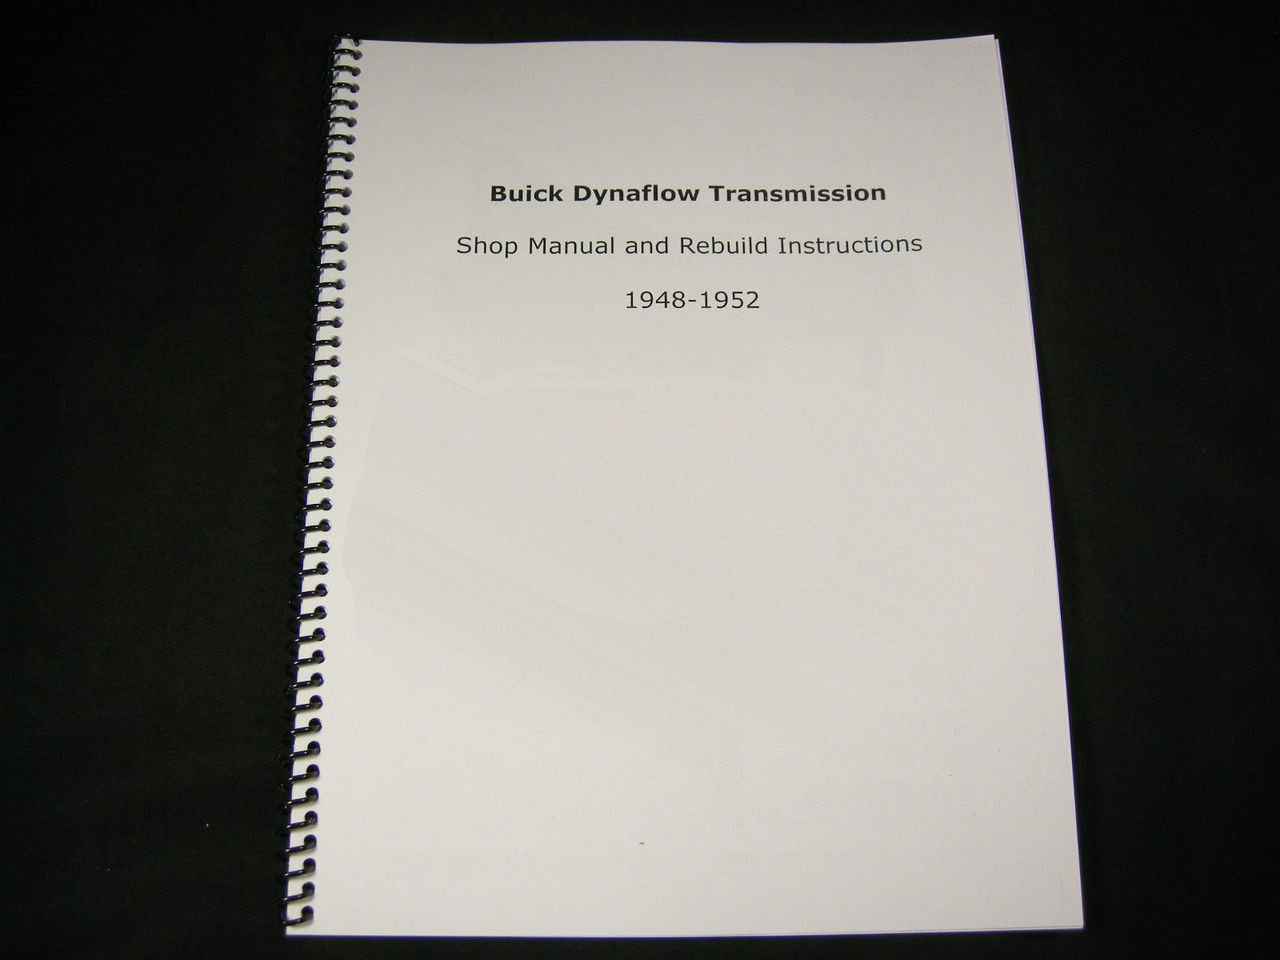 Cast Iron Powerglide Rebuild Manual